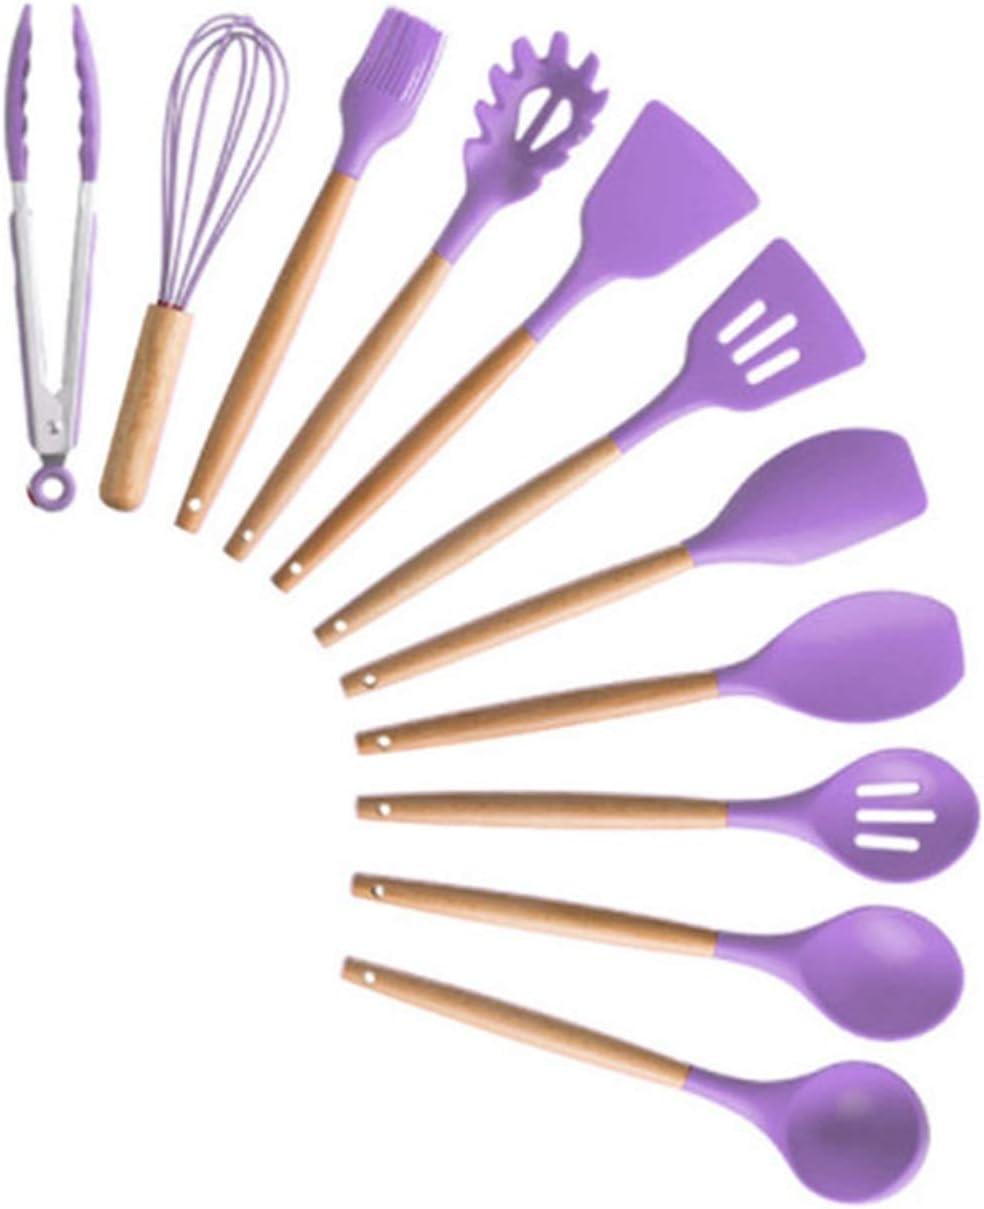 Sale Special Price YIBOZY Spasm price Silicone Cooking Kitchen Utensils S Non-Stick Spatula Set